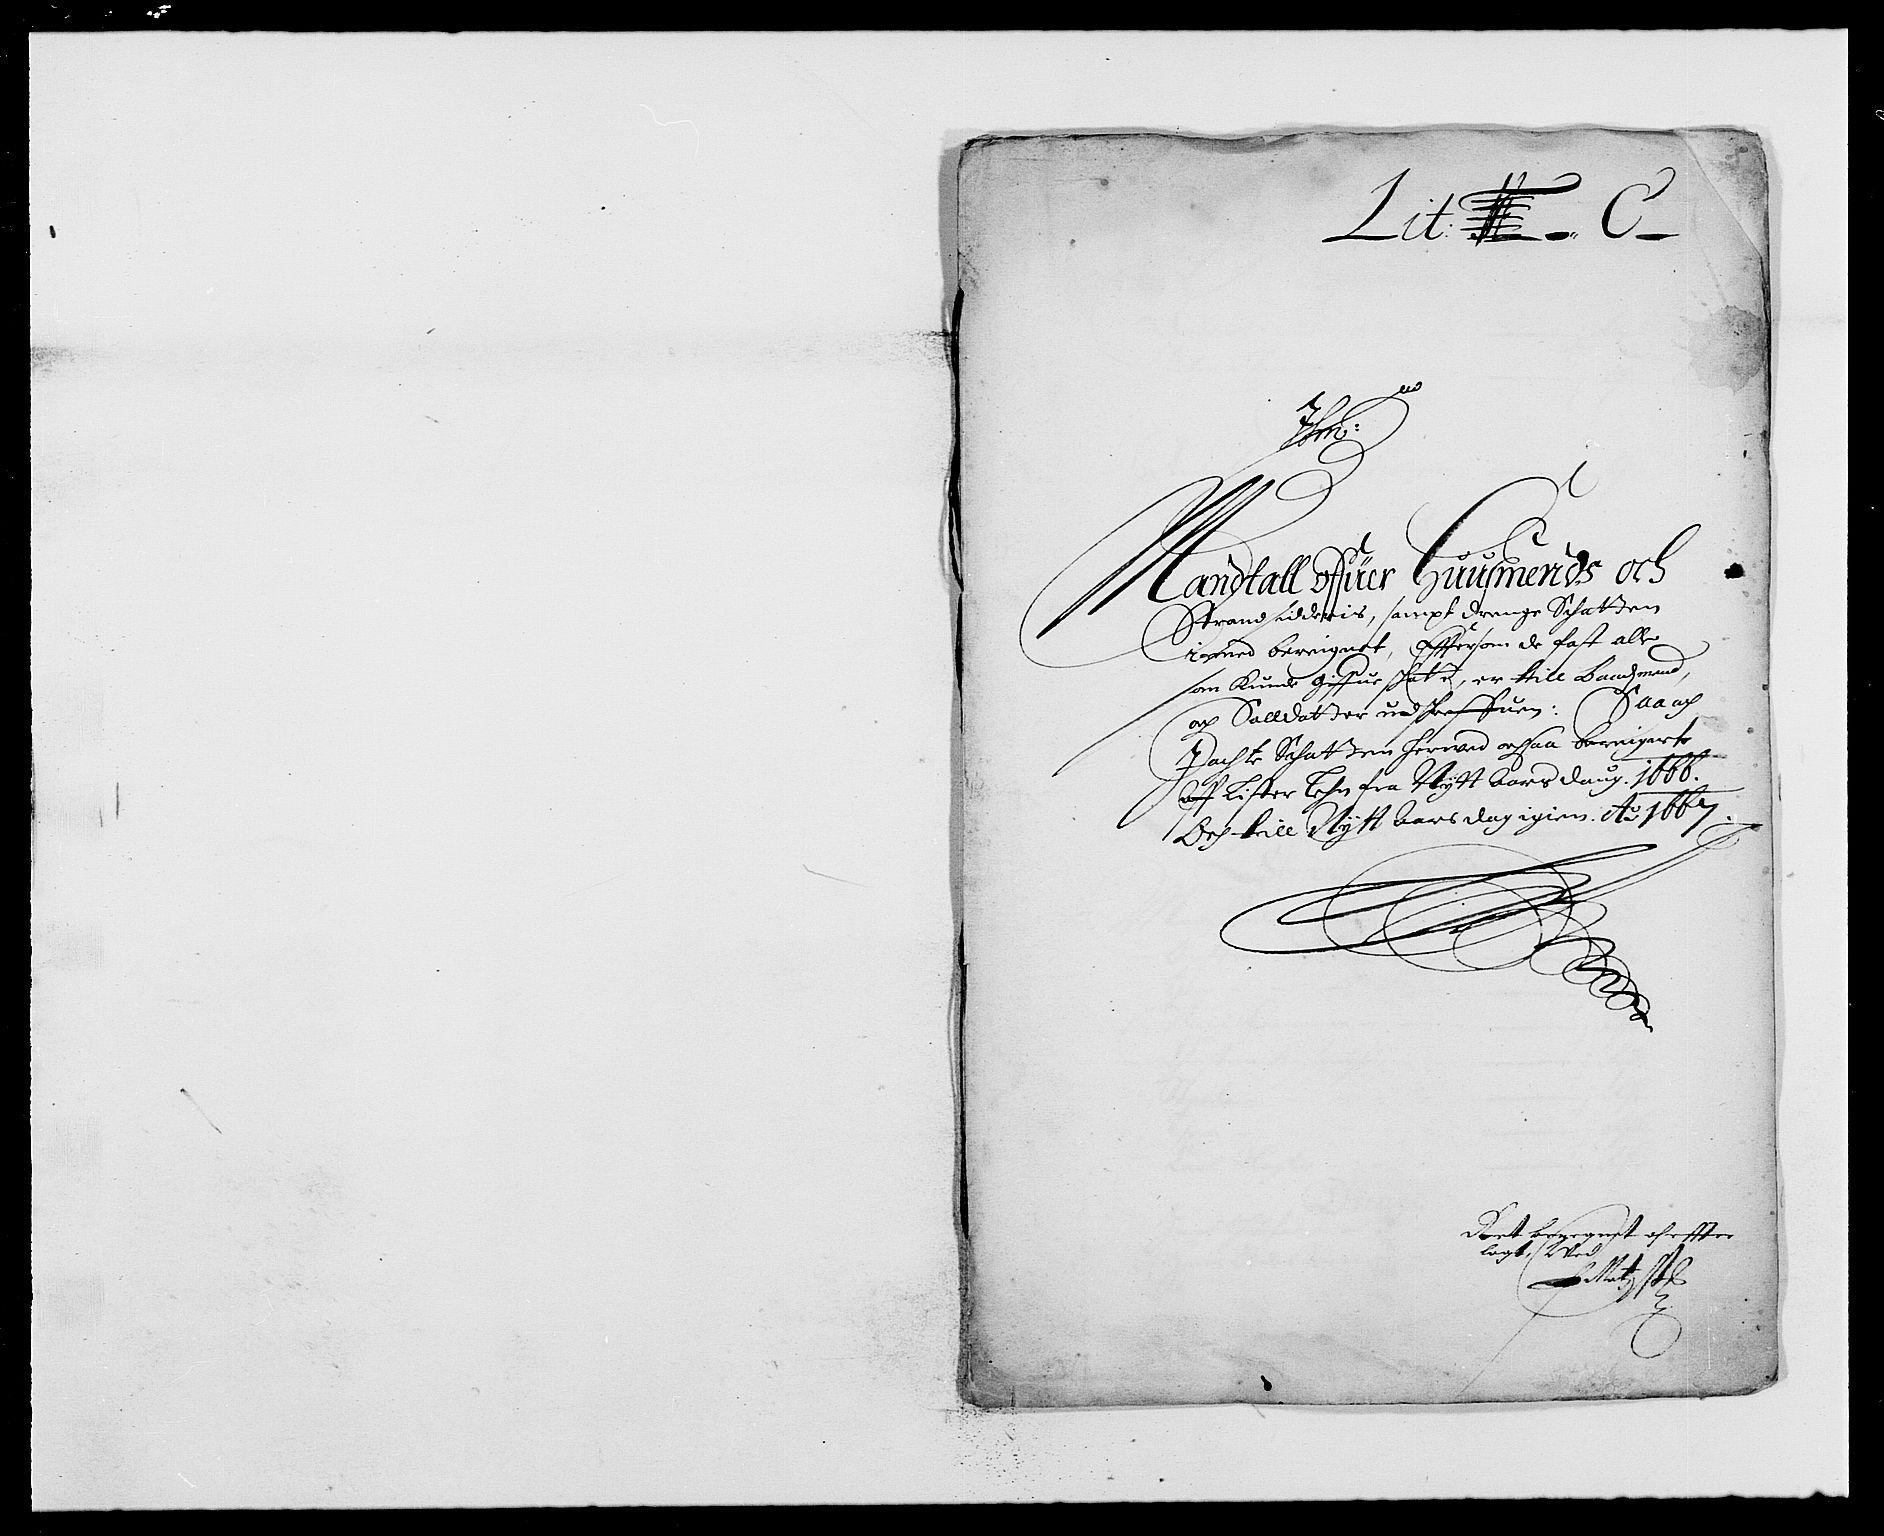 RA, Rentekammeret inntil 1814, Reviderte regnskaper, Fogderegnskap, R41/L2524: Fogderegnskap Lista, 1665-1668, s. 221